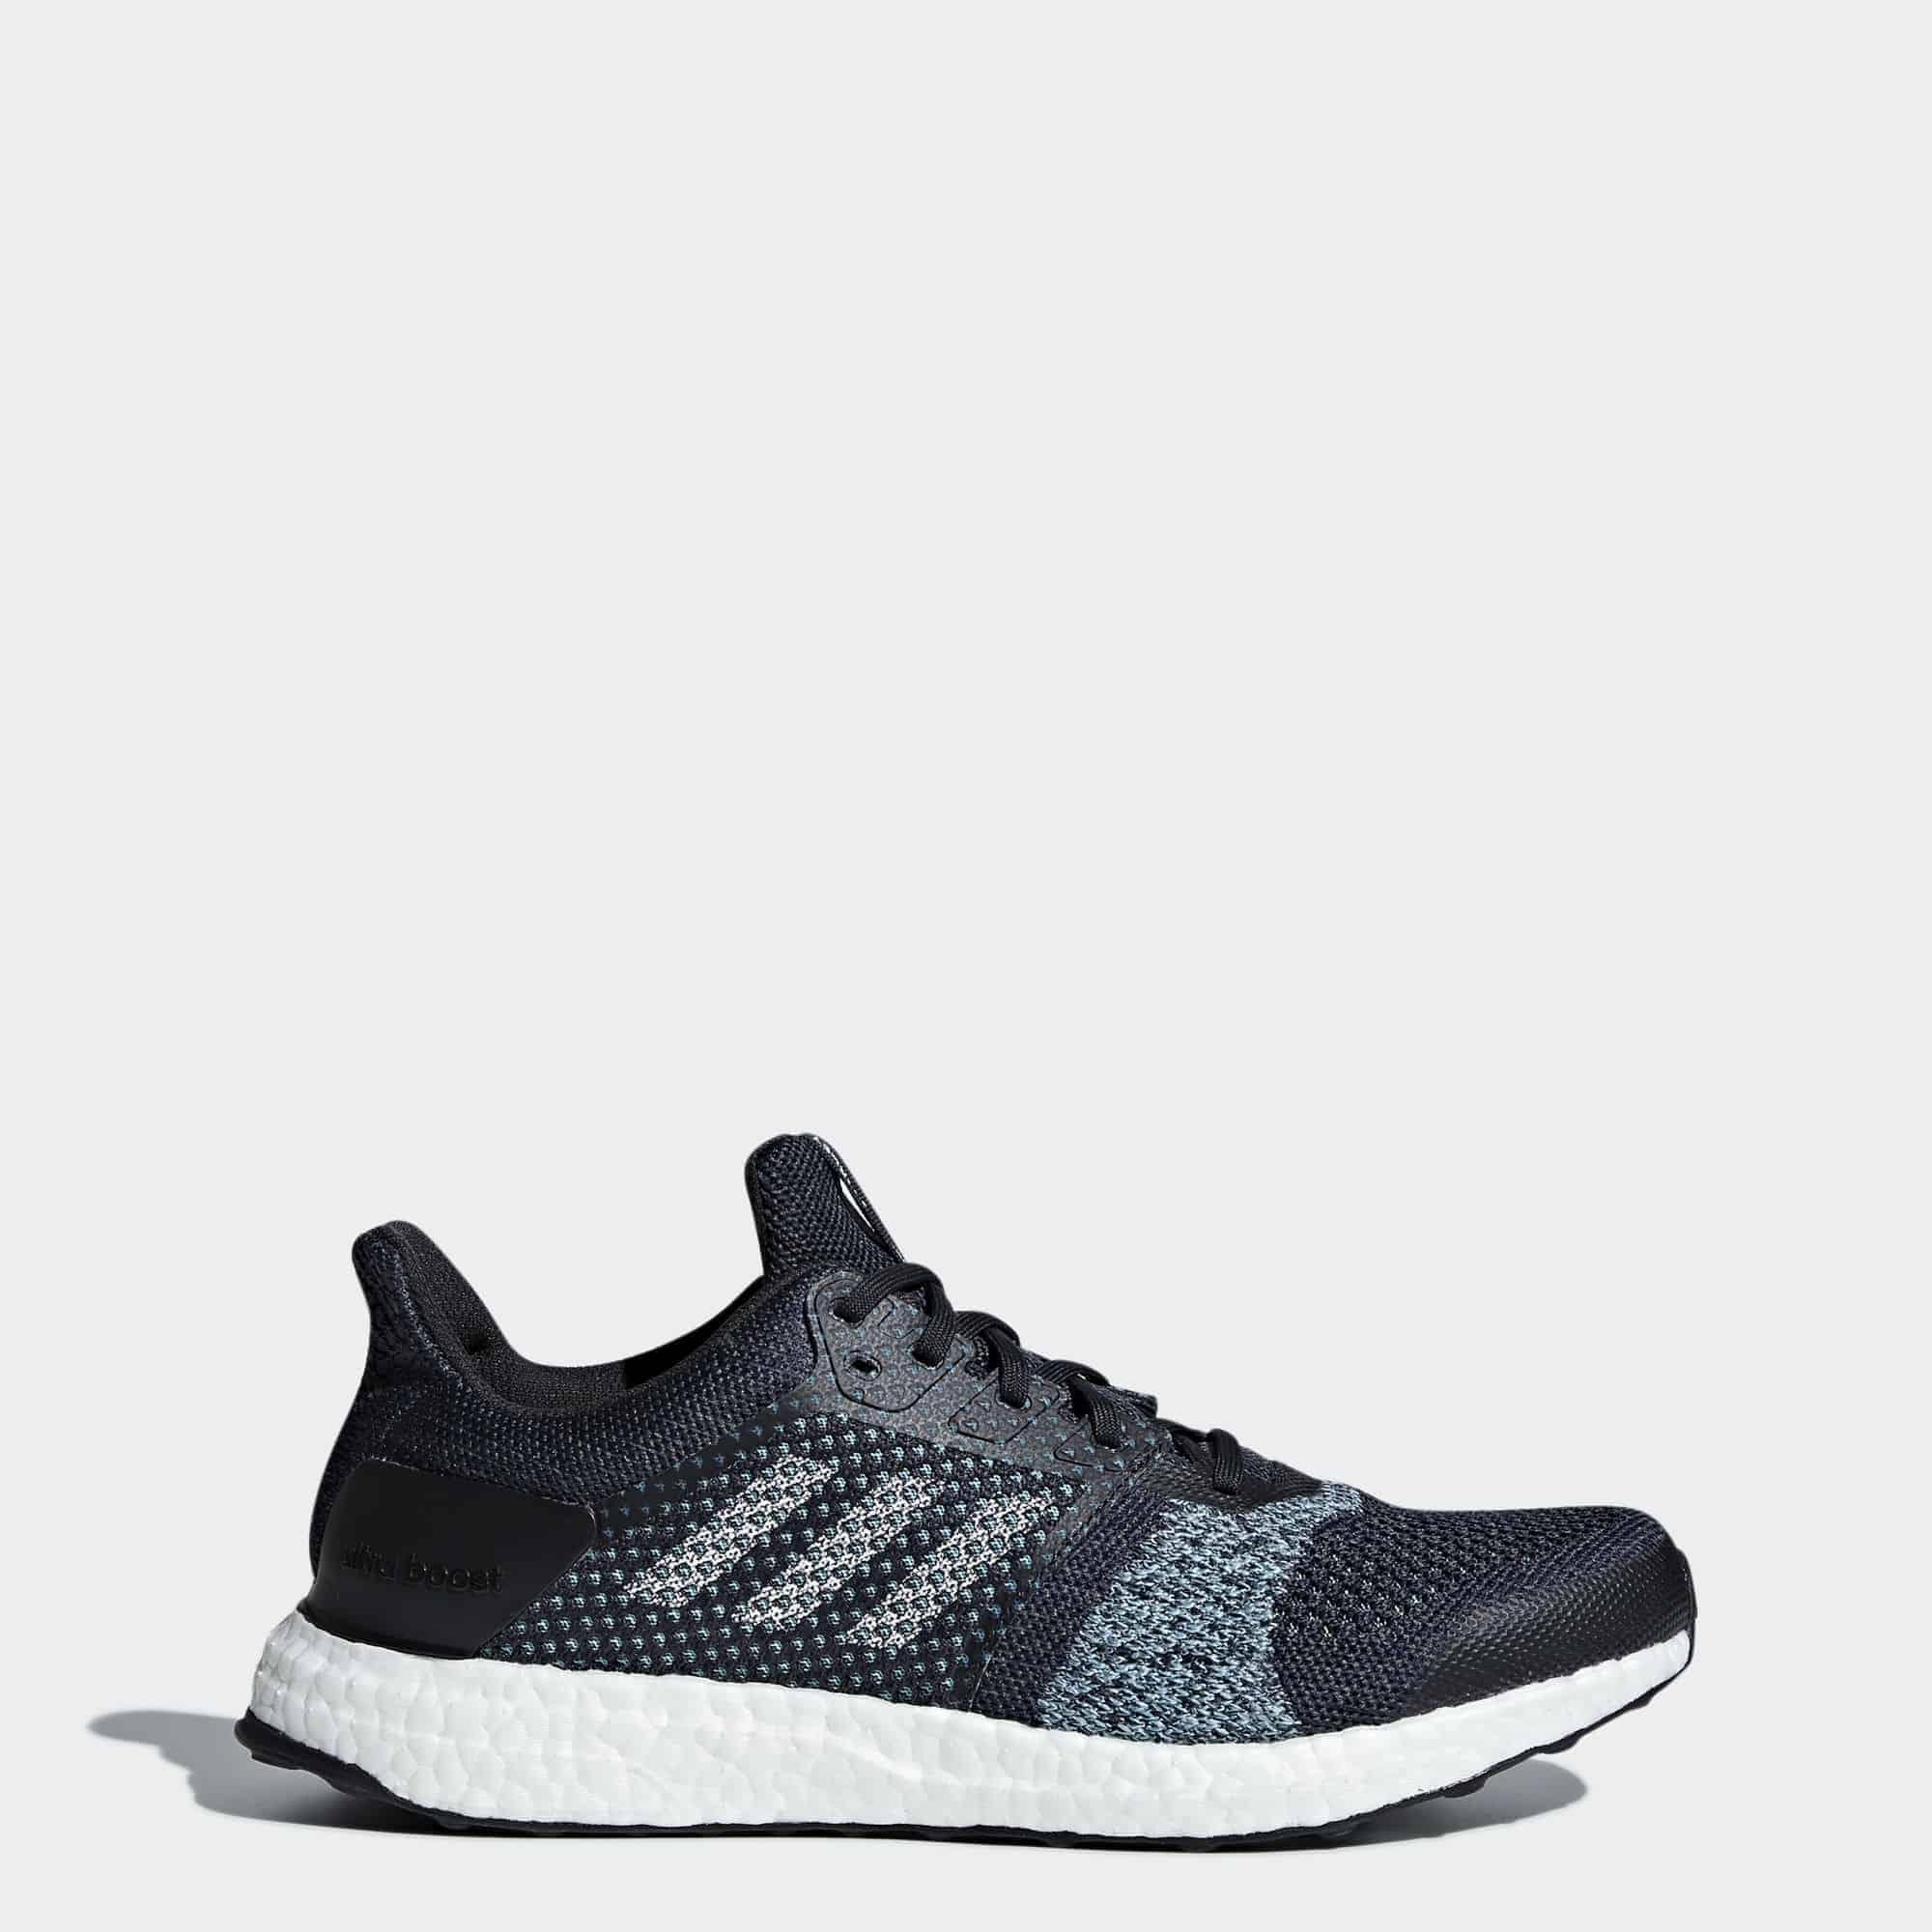 Кроссовки для бега Adidas Ultraboost ST Parley мужские